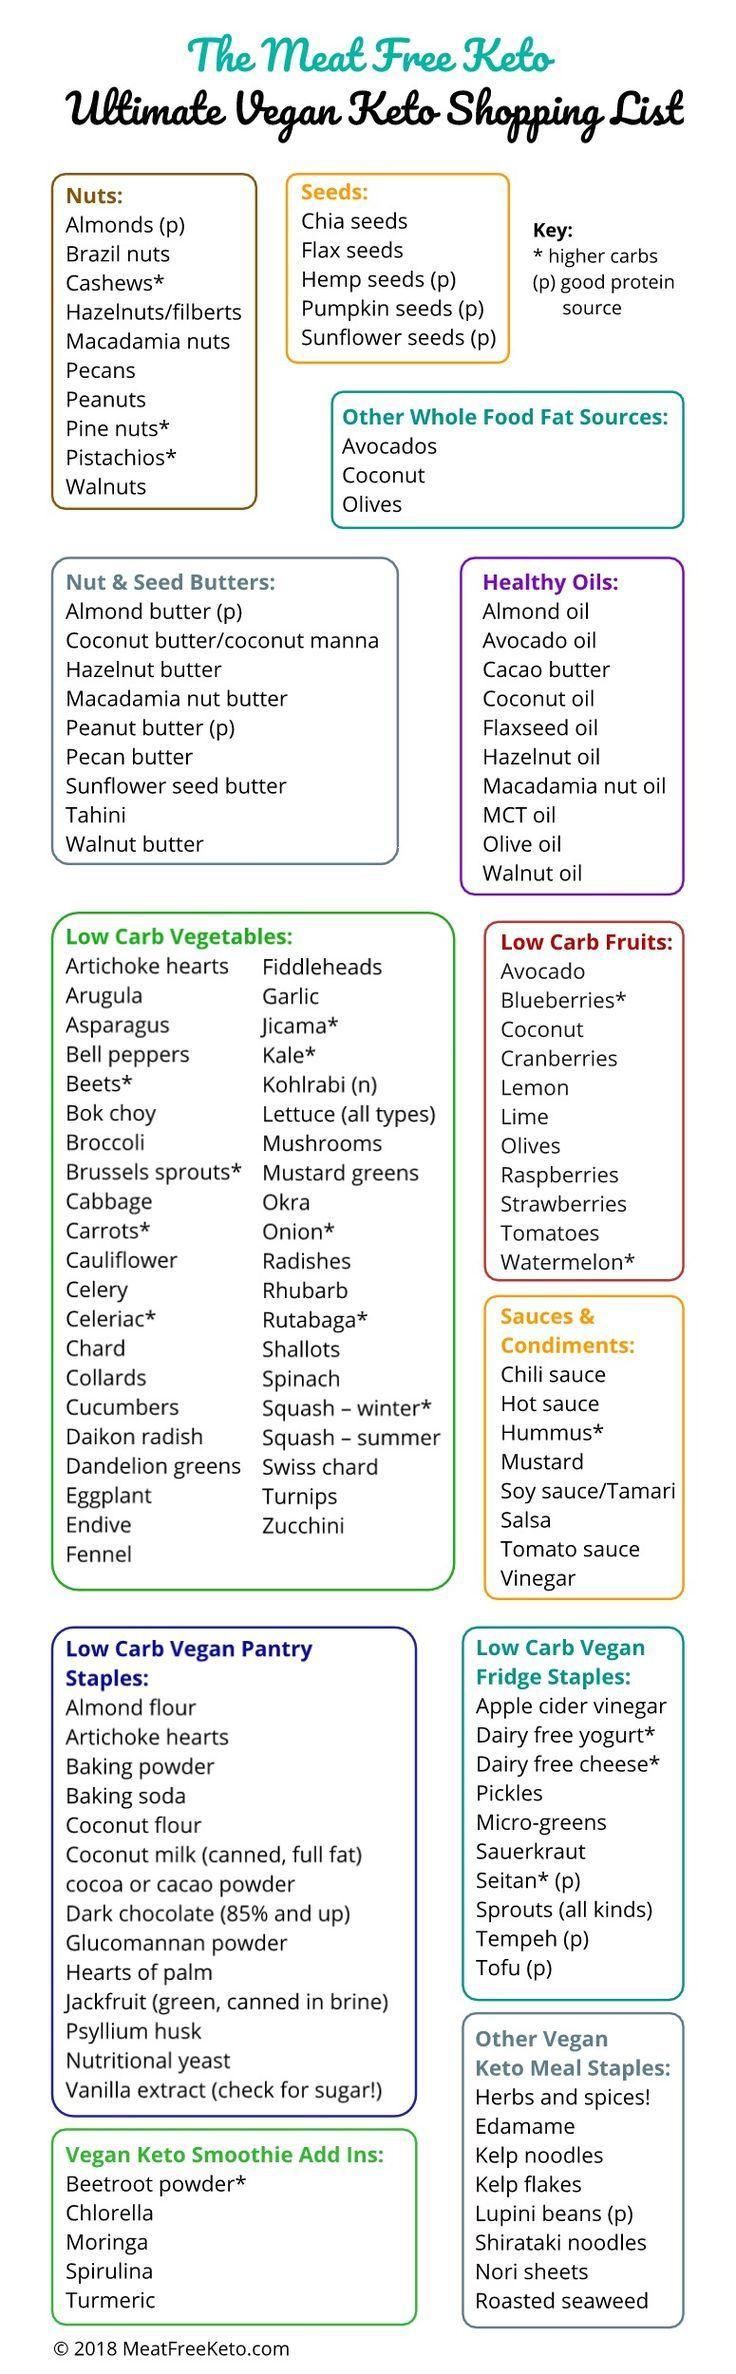 The Ultimate Vegan Keto Shopping List Vegan keto recipes